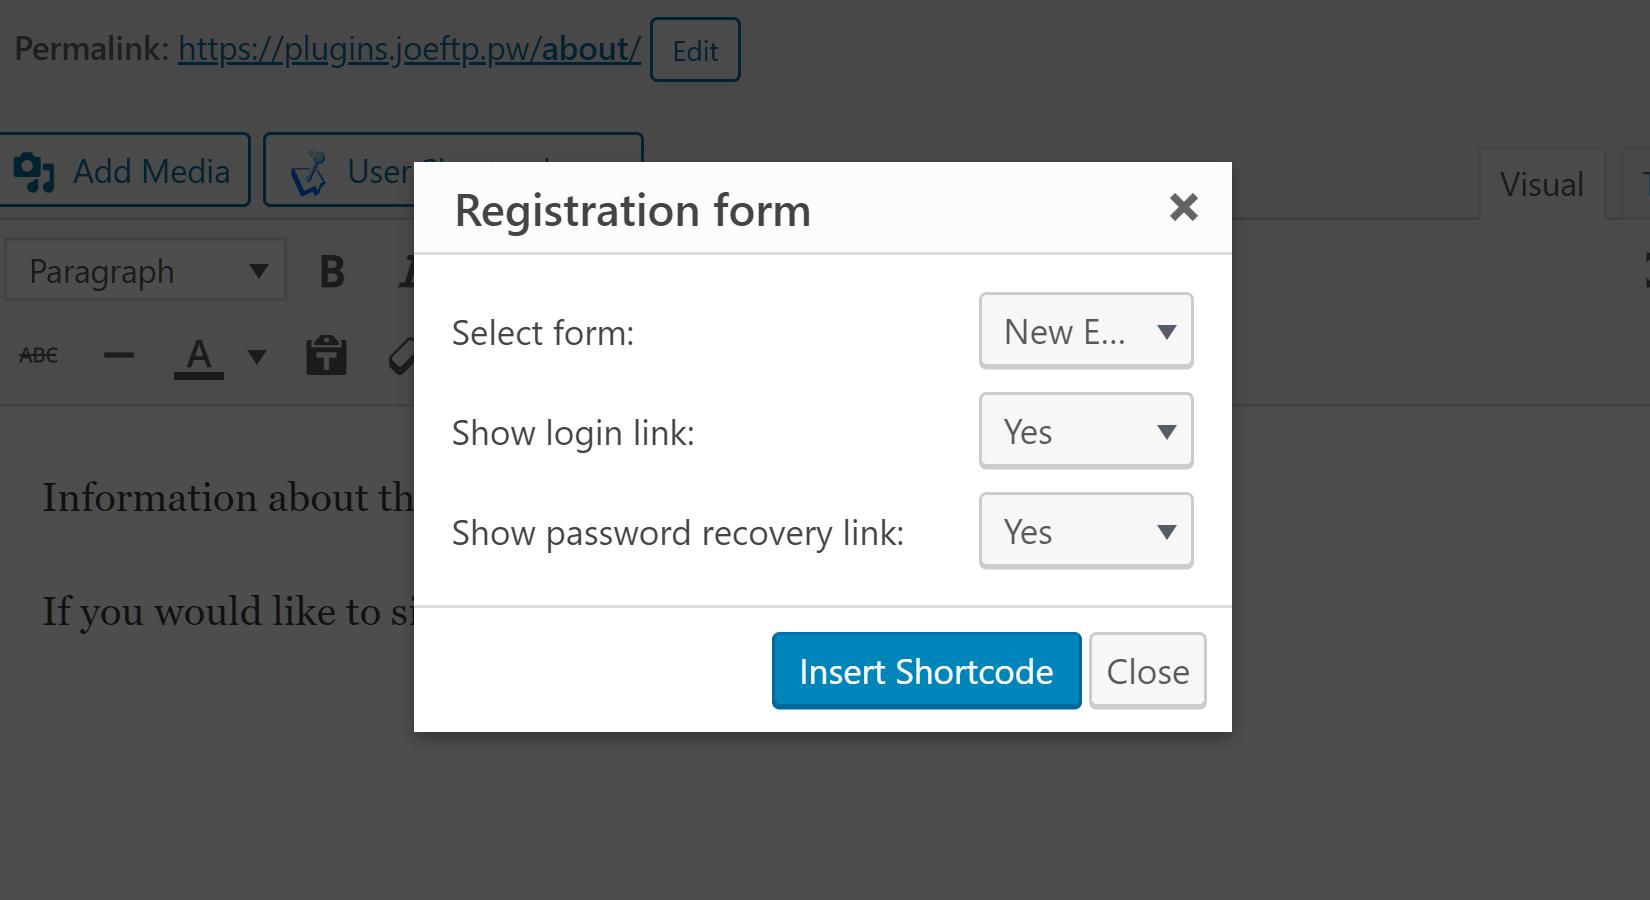 Registraiton Form Shortcode Generator